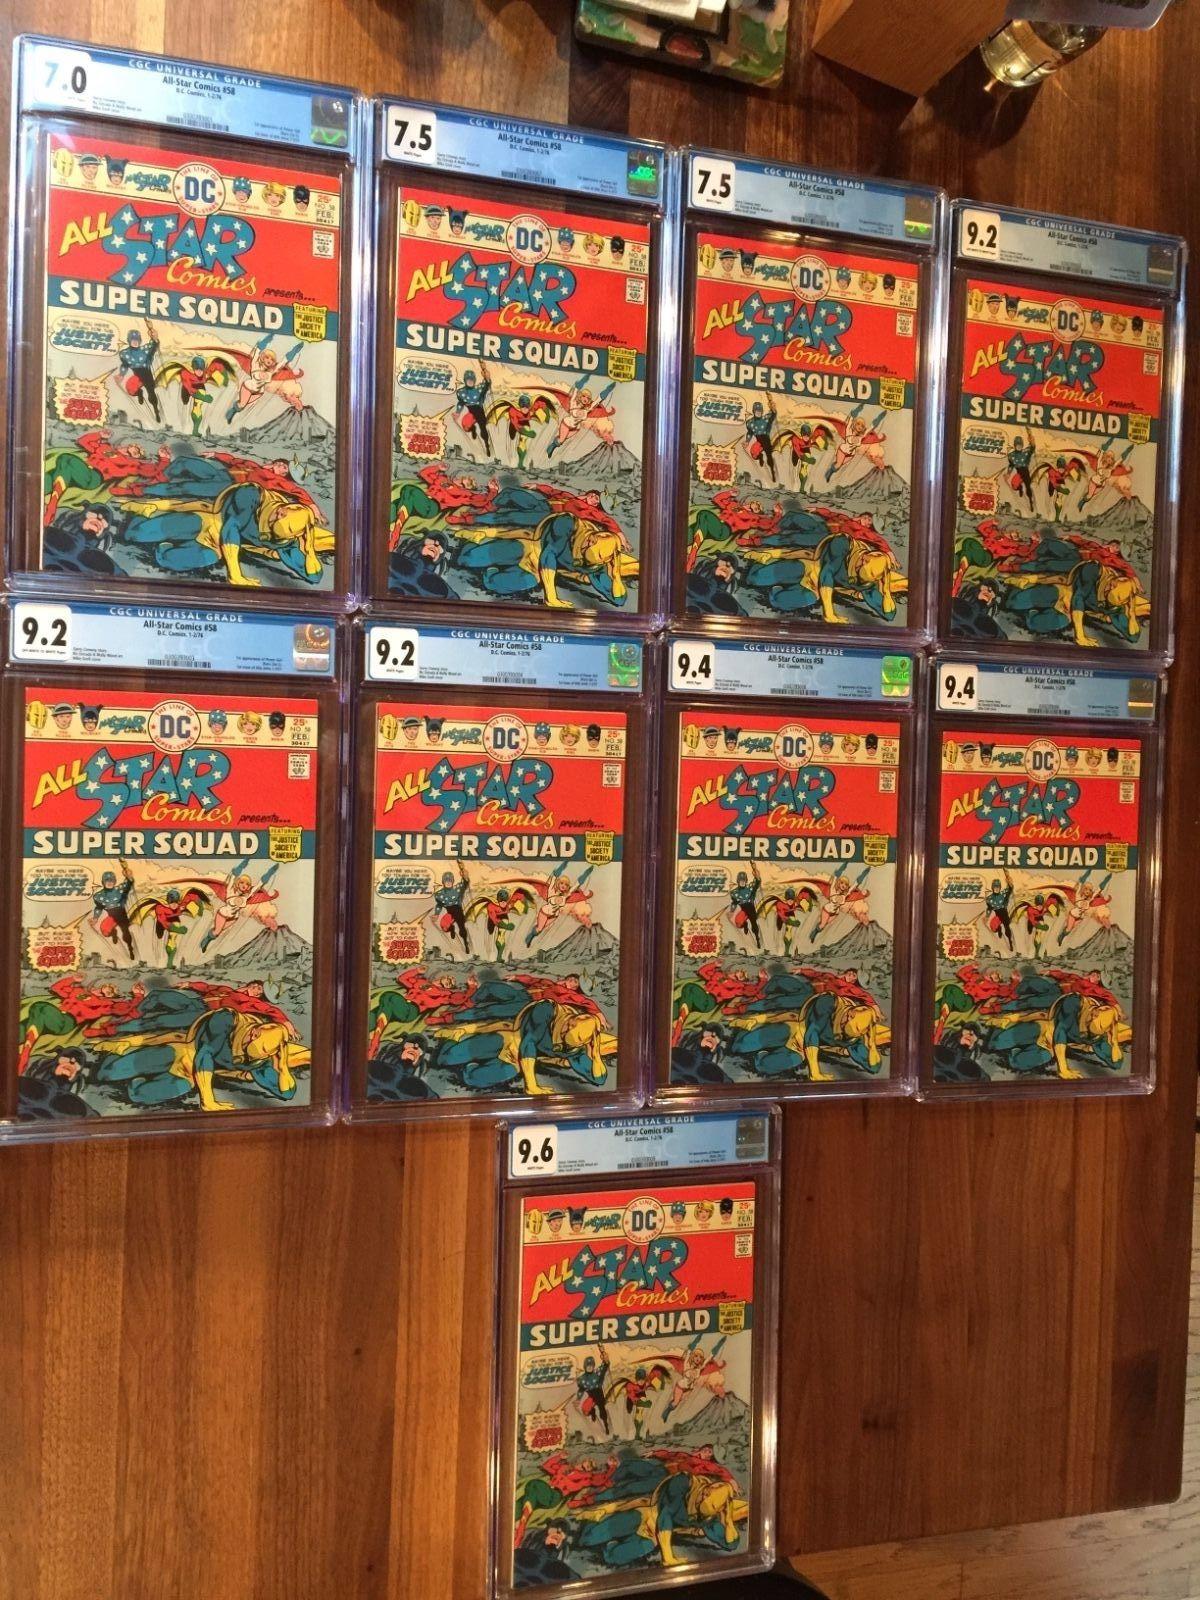 RARE 1976 BRONZE AGE ALL-STAR COMICS #58 CGC 7.0, 7.5, 9.2, 9.4, 9.6 POWER GIRL